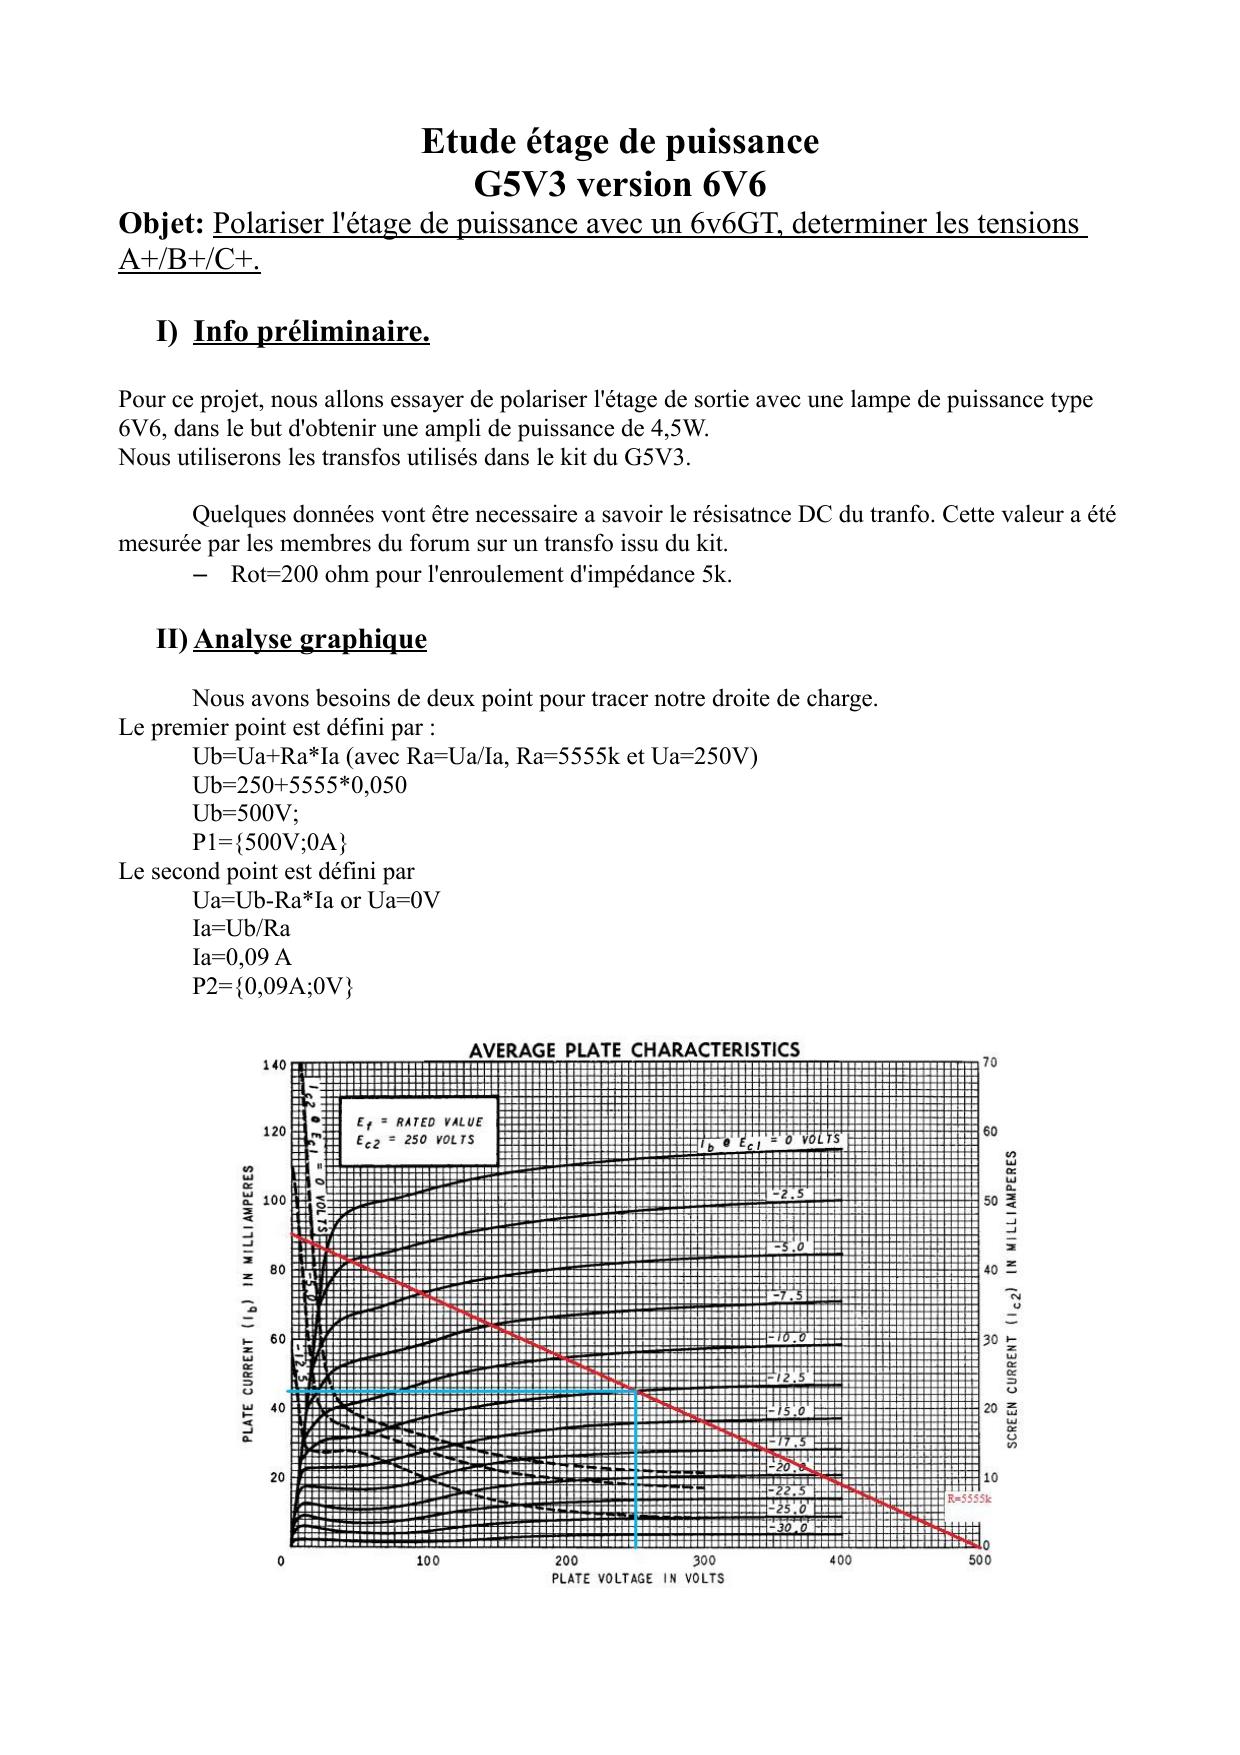 Etude étage de puissance G5V3 version 6V6 Objet: I) Info préliminaire